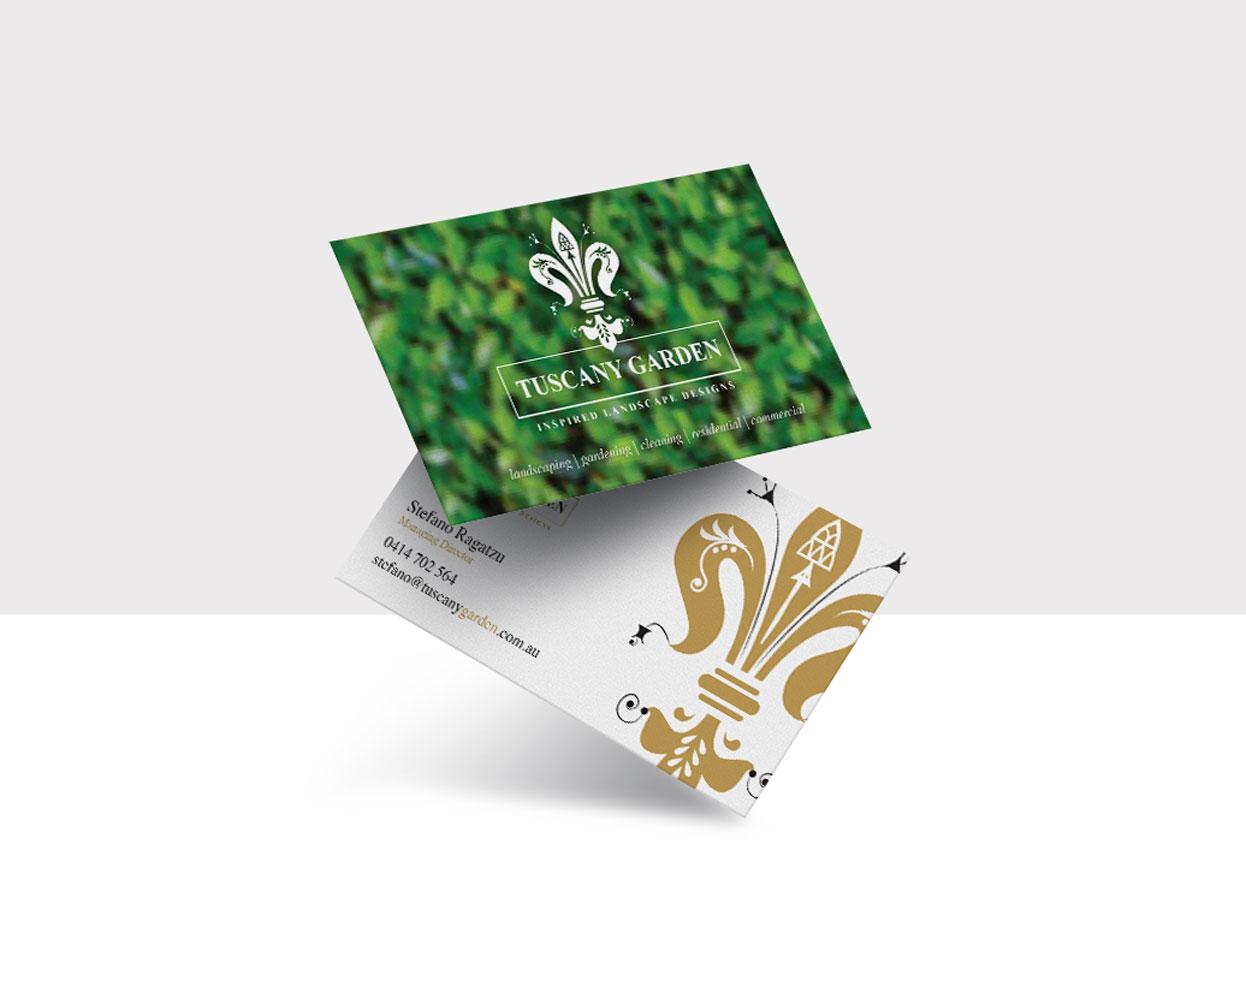 Tuscany Garden Branding Mela Creative Business Cards